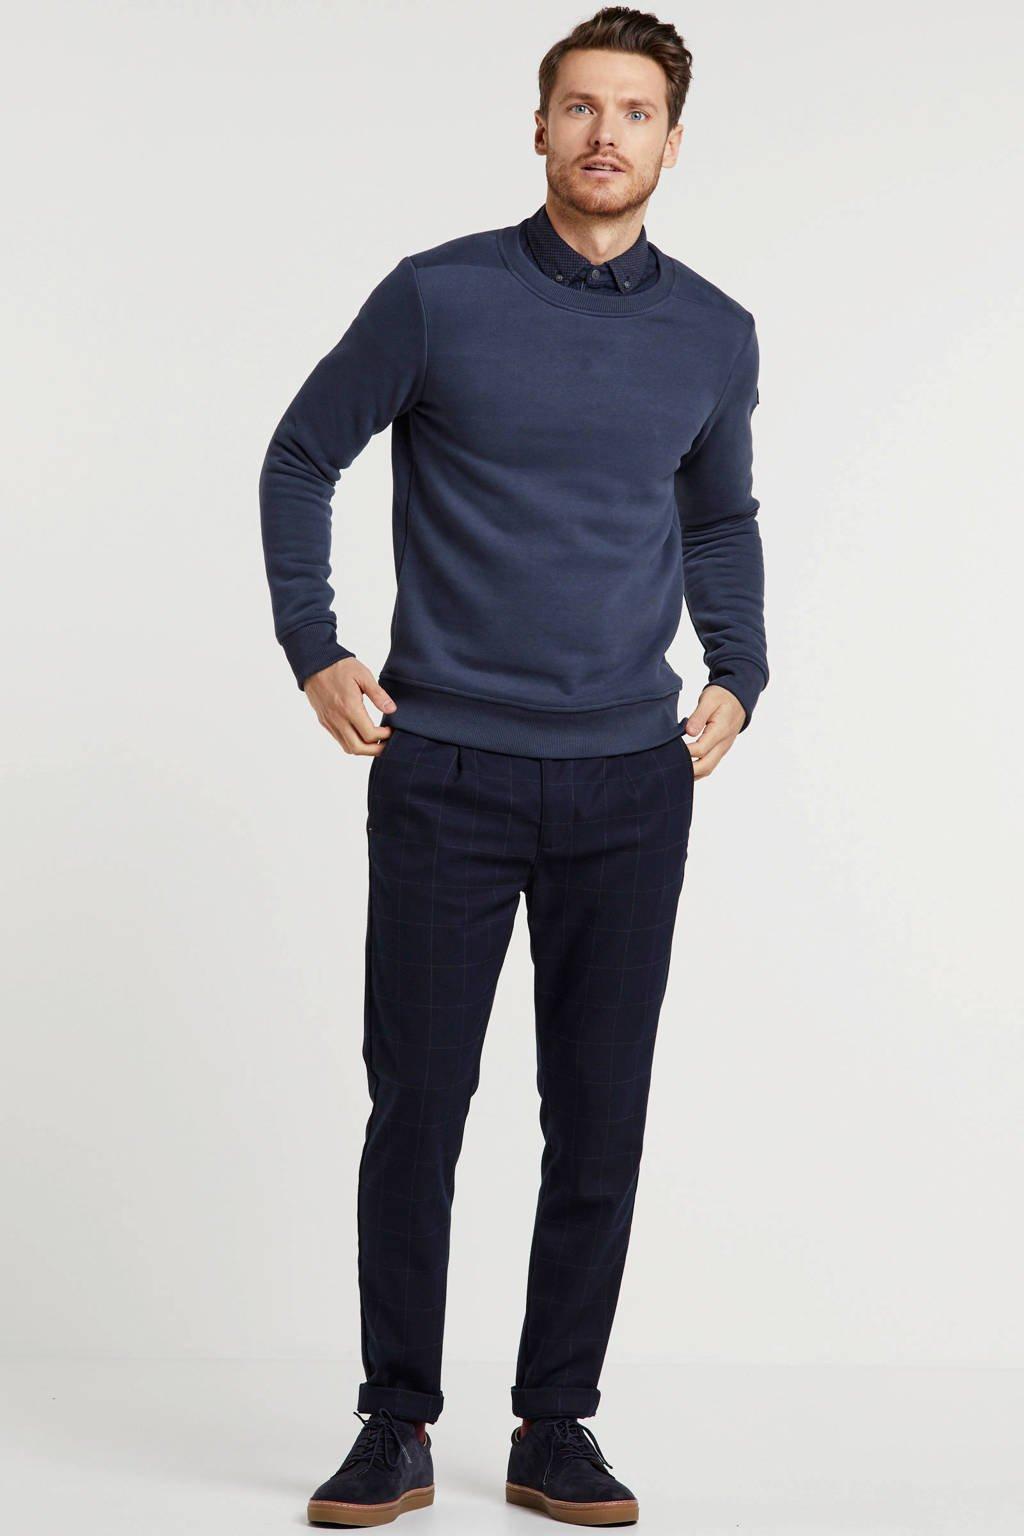 JACK & JONES PREMIUM sweater blauw, Blauw